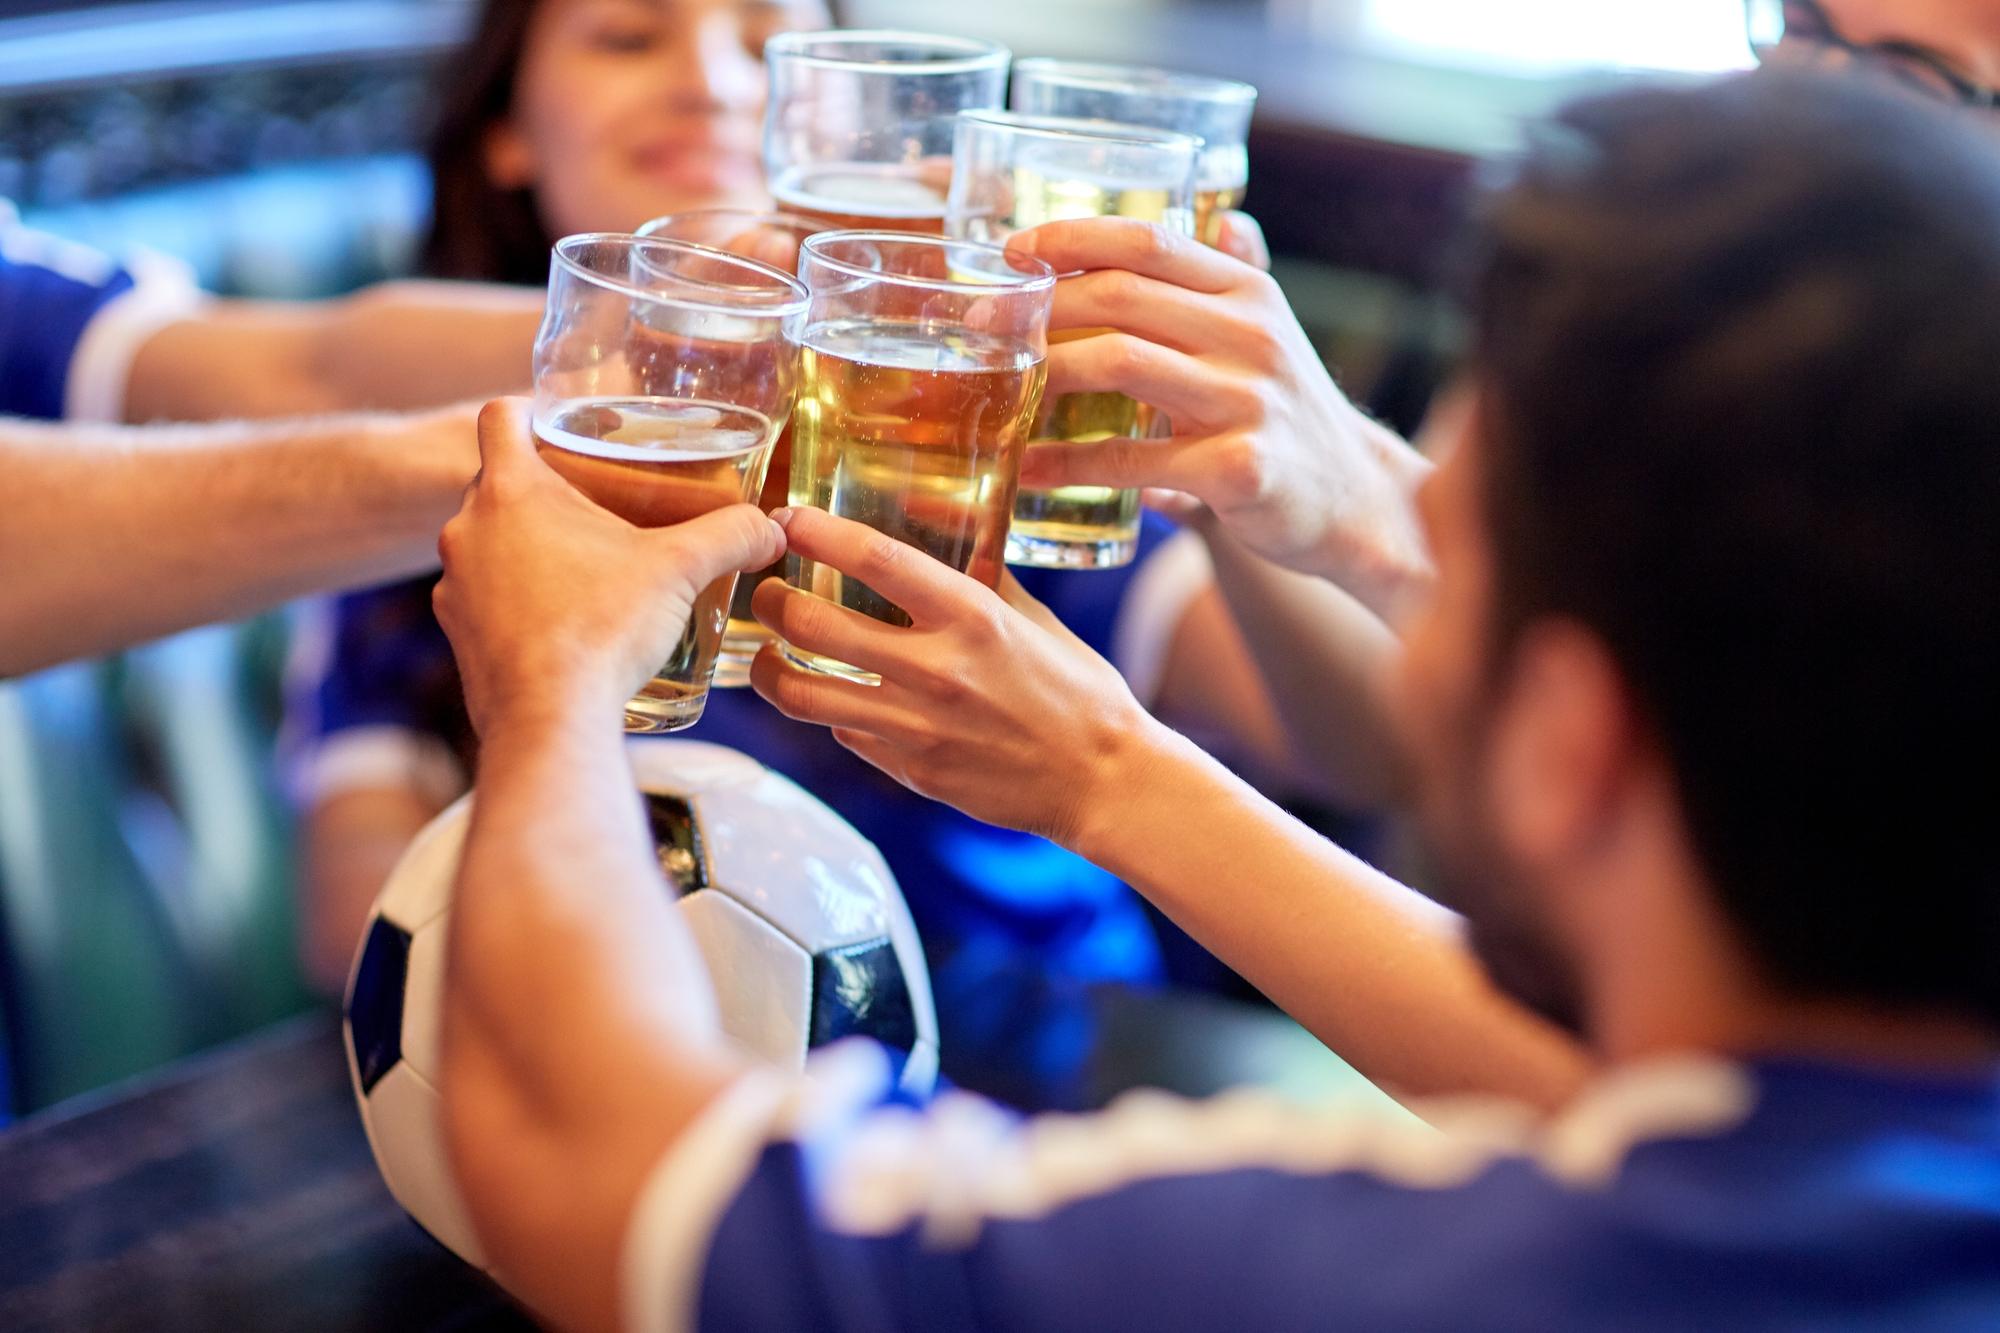 FOOTBALL CAFE CAMPNOU(フットボールカフェ・カンプノウ)